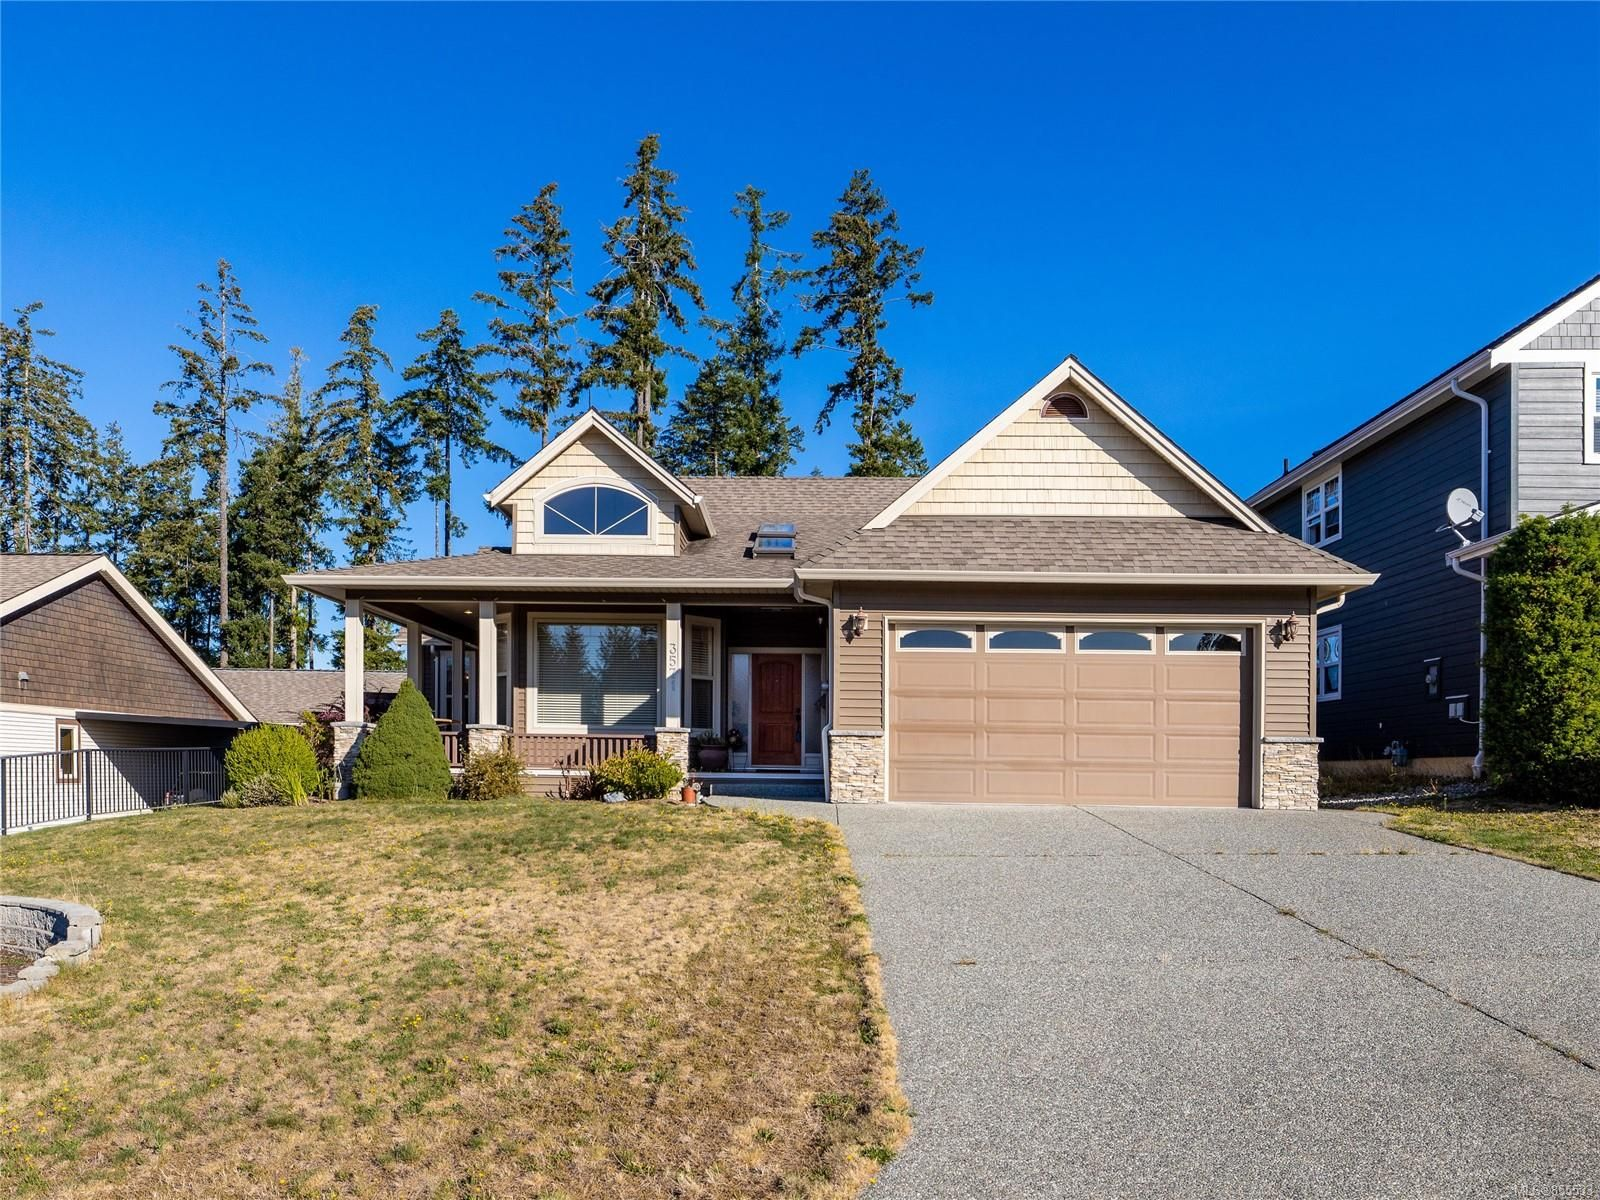 Main Photo: 3571 McKnight St in : PA Port Alberni House for sale (Port Alberni)  : MLS®# 855533